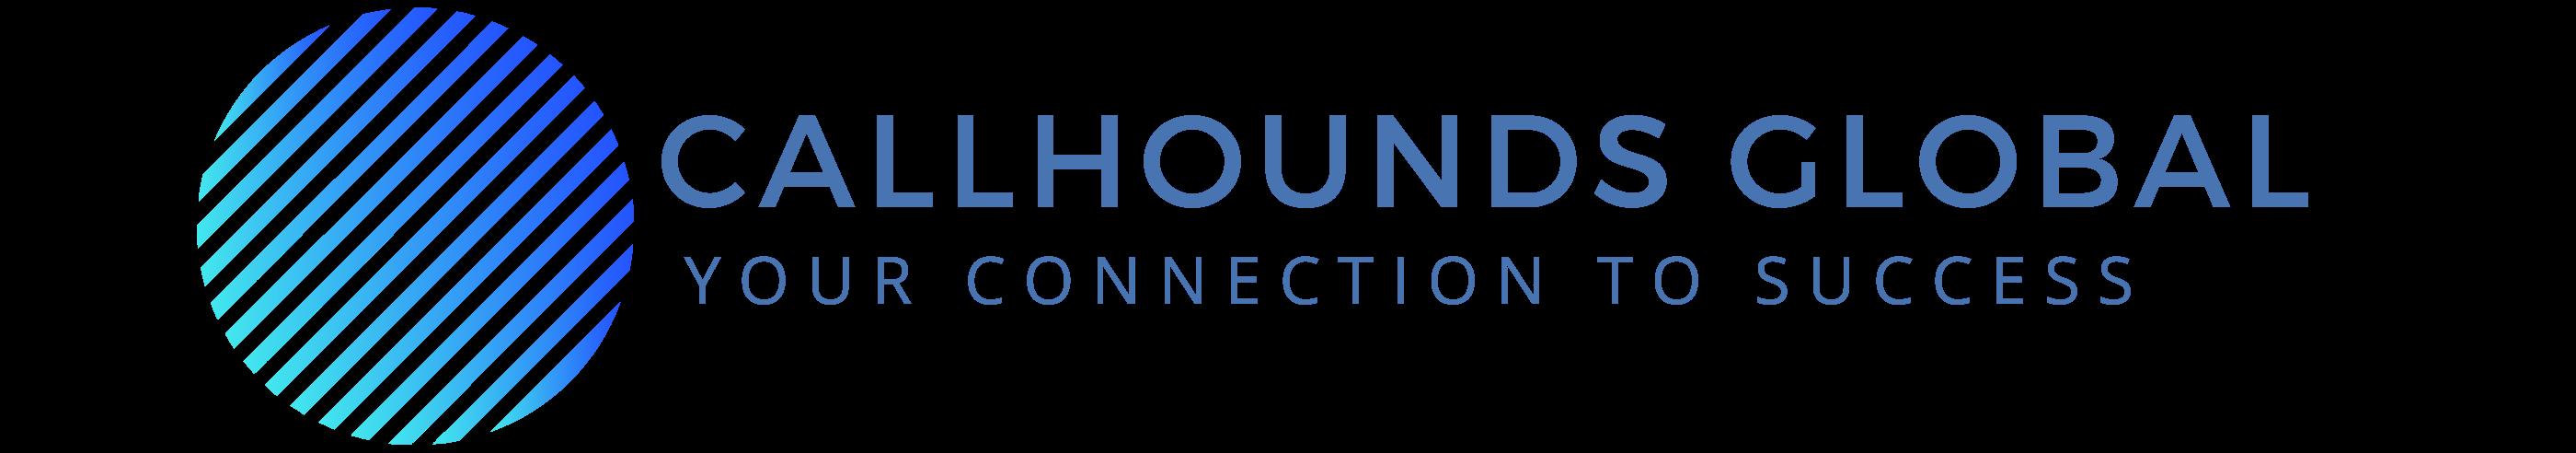 Callhounds Globa BPO